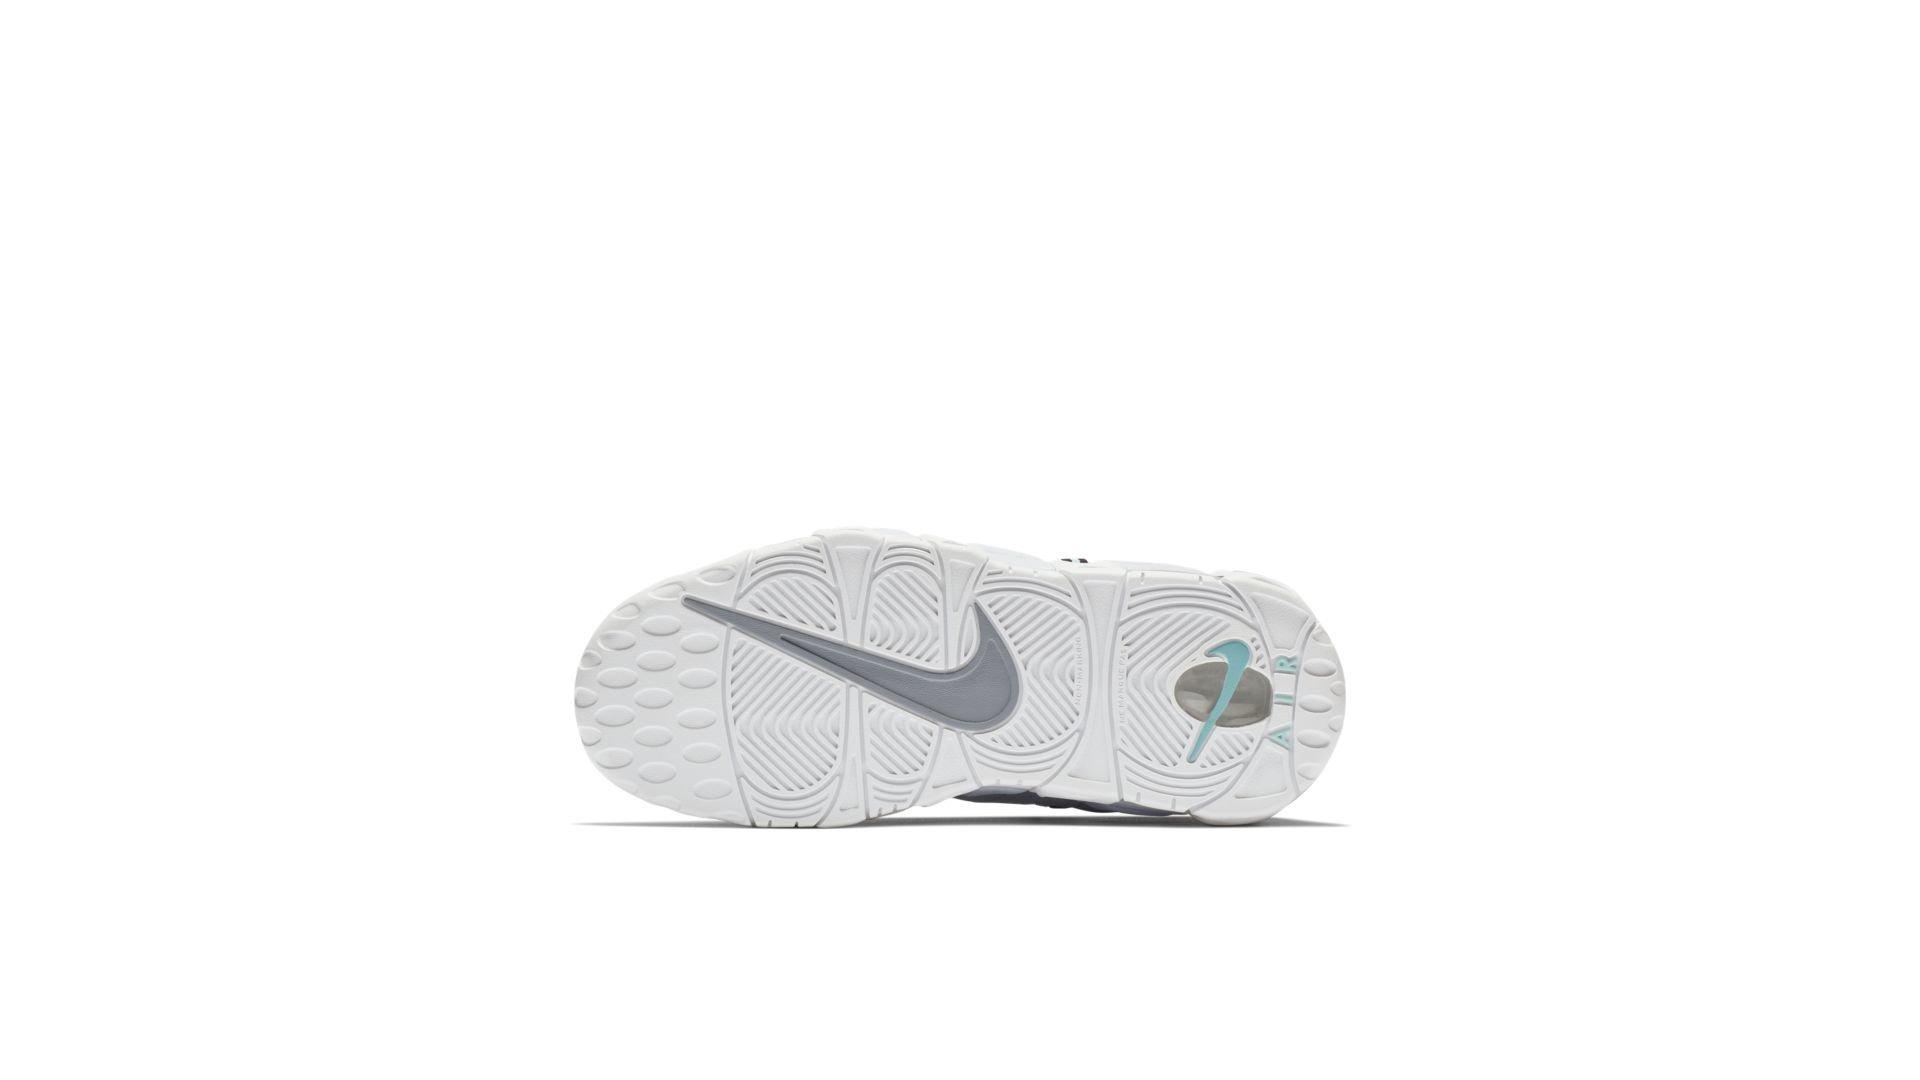 Nike Air More Money Wolf Grey Island Green (GS) (AH5215-002)